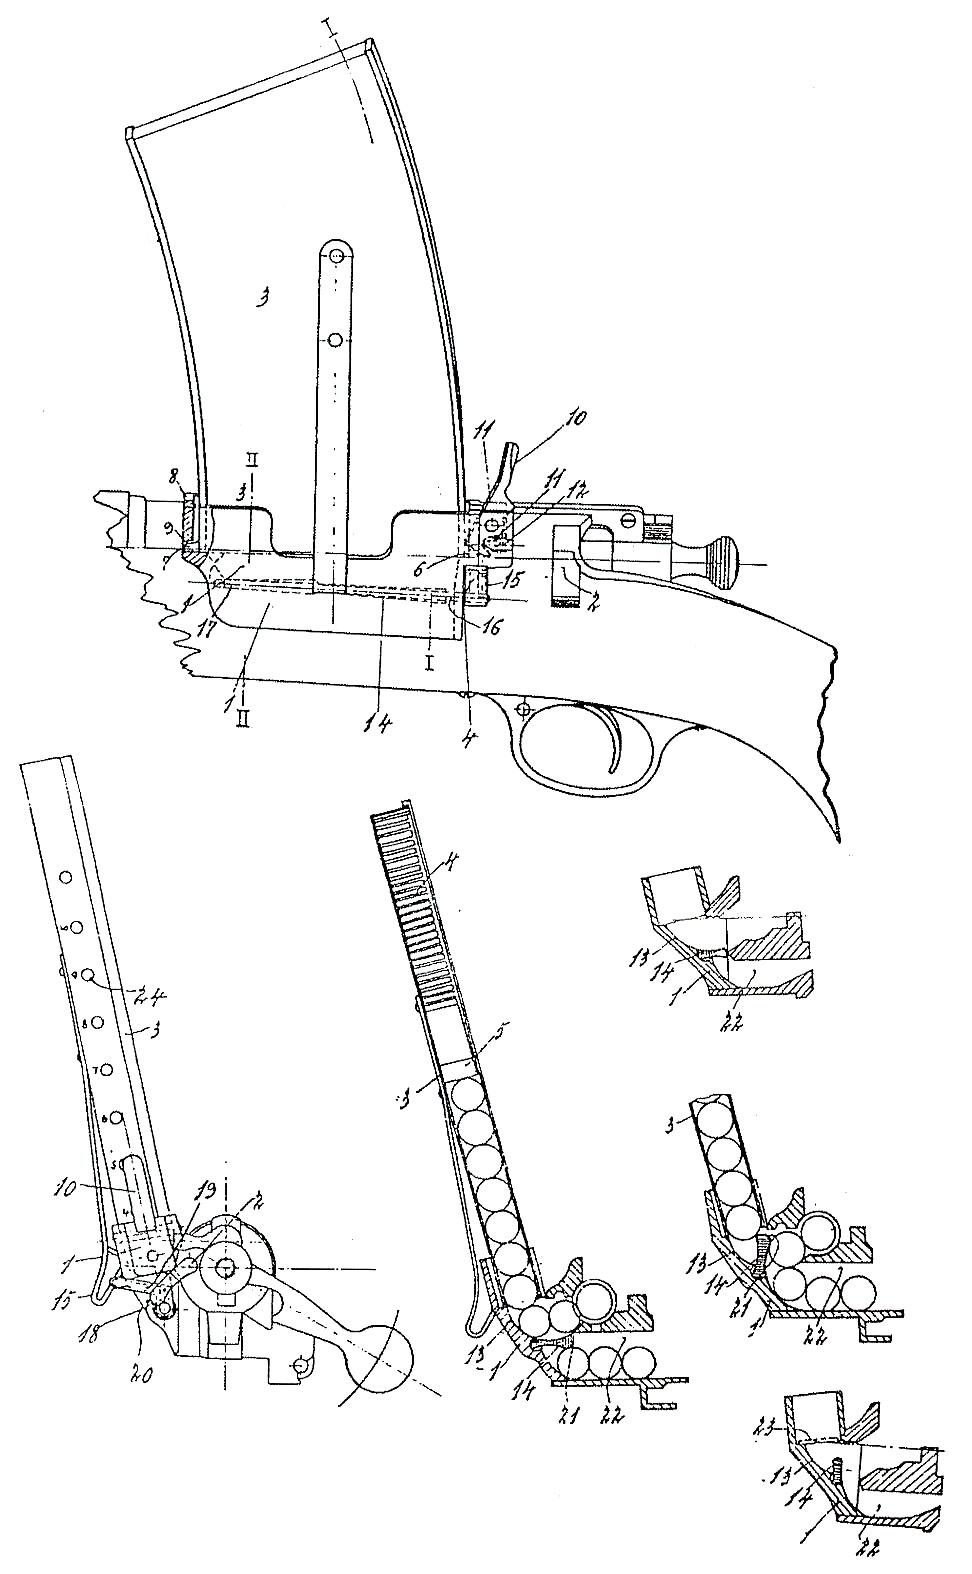 Krag-Jorgensen blueprint